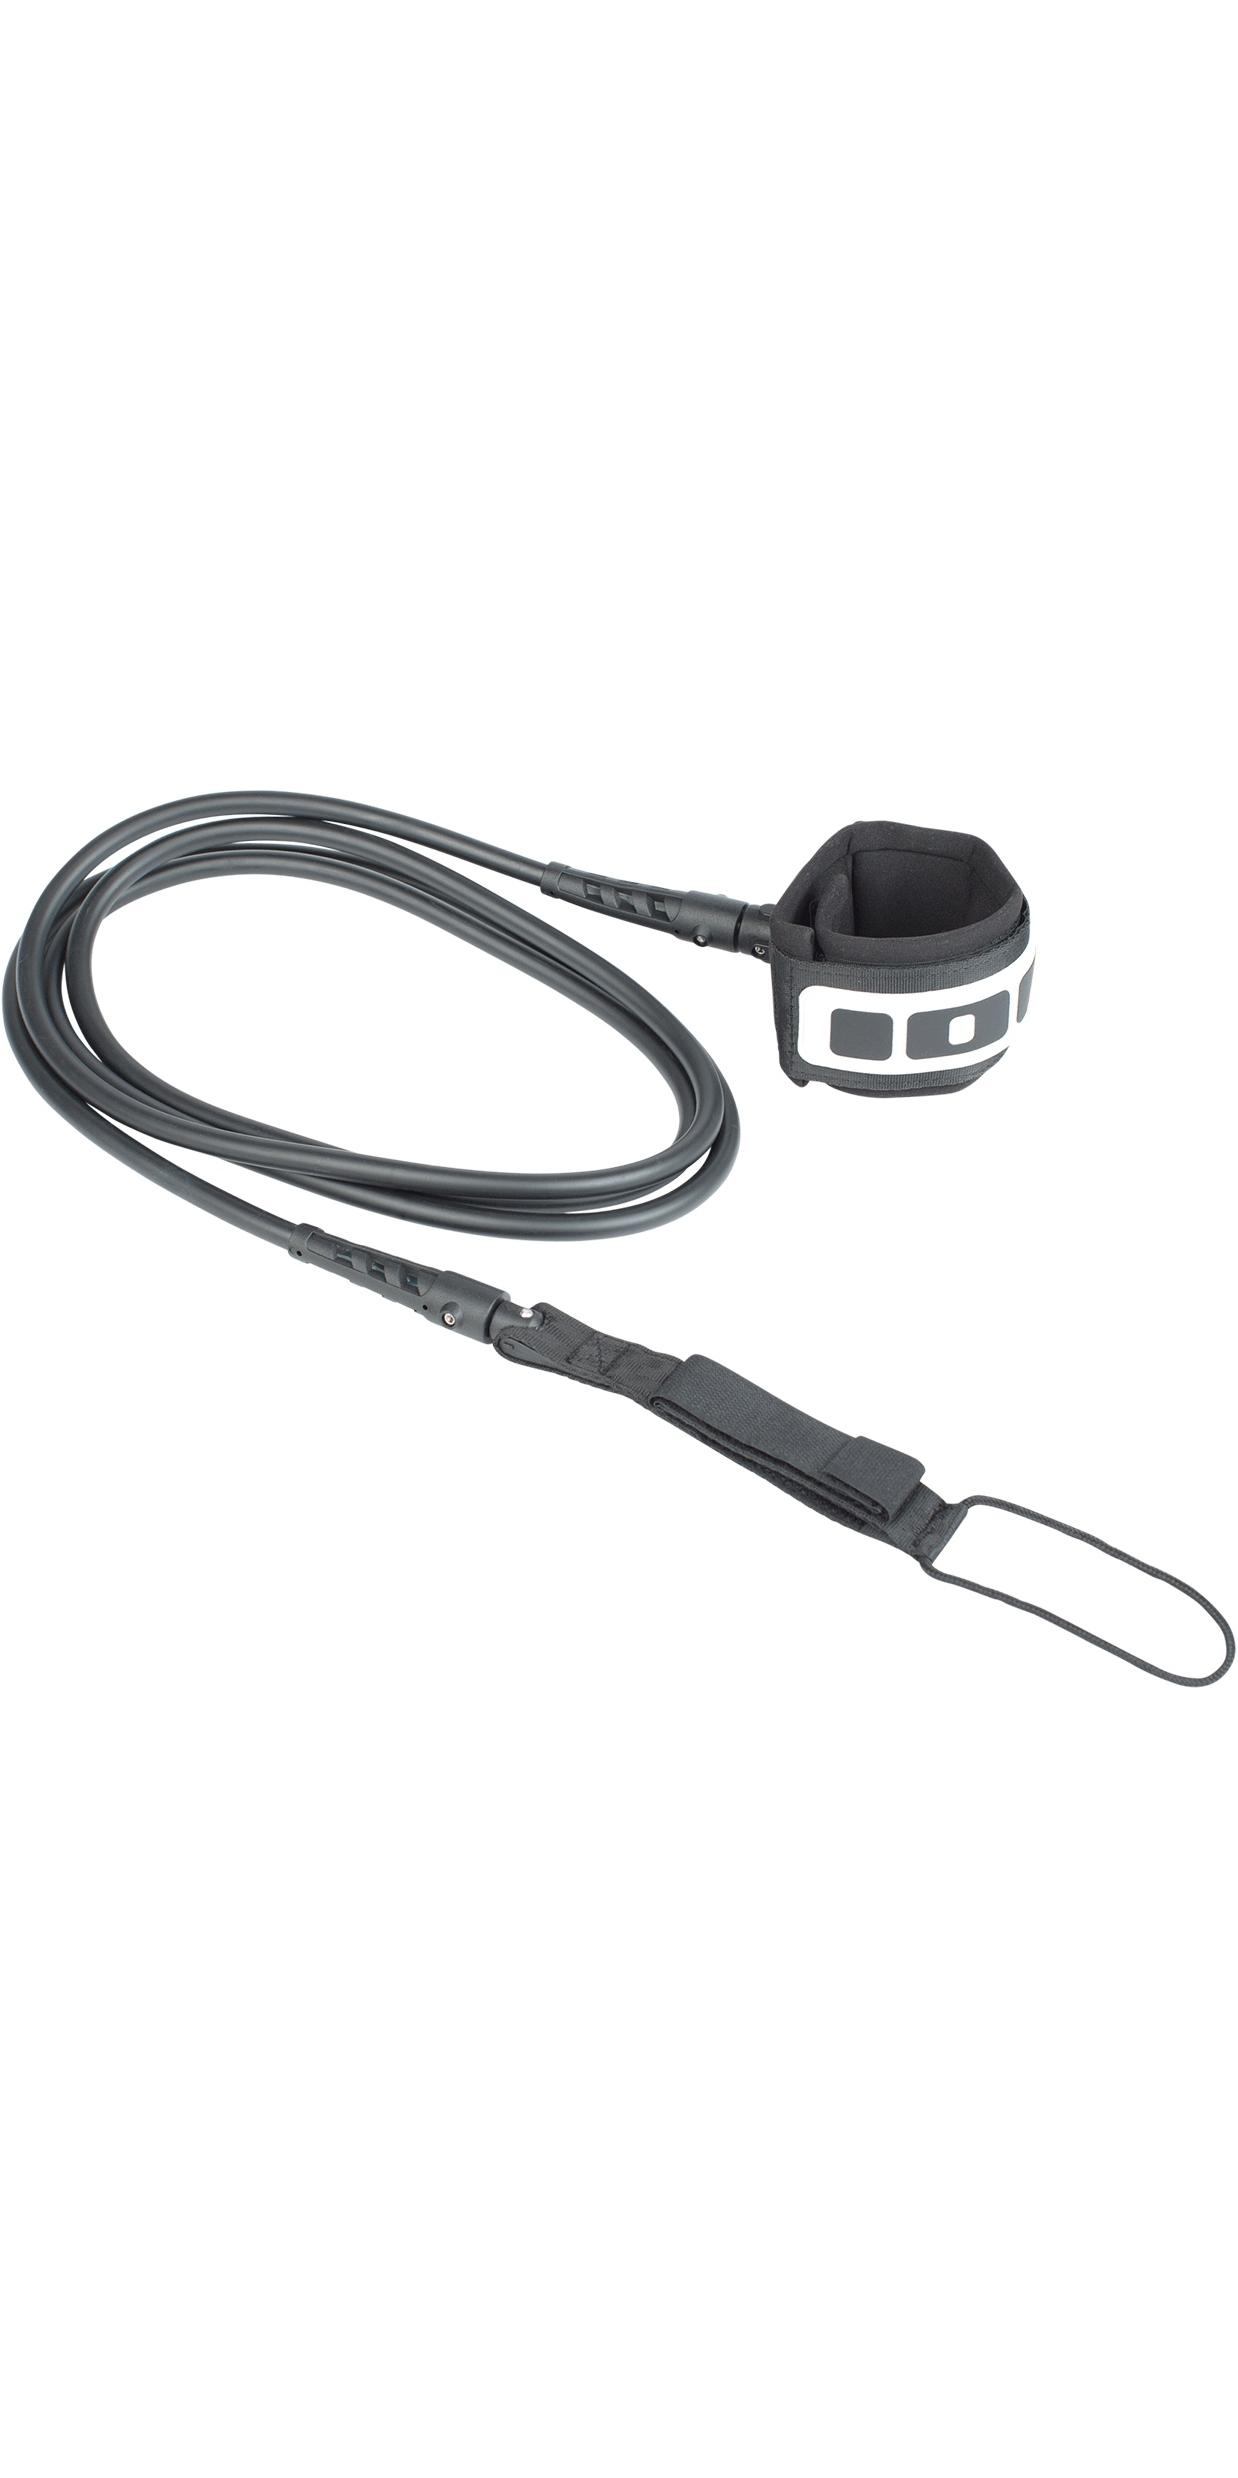 Fanatic Ion 10'0 SUP Core Leash Black 48700